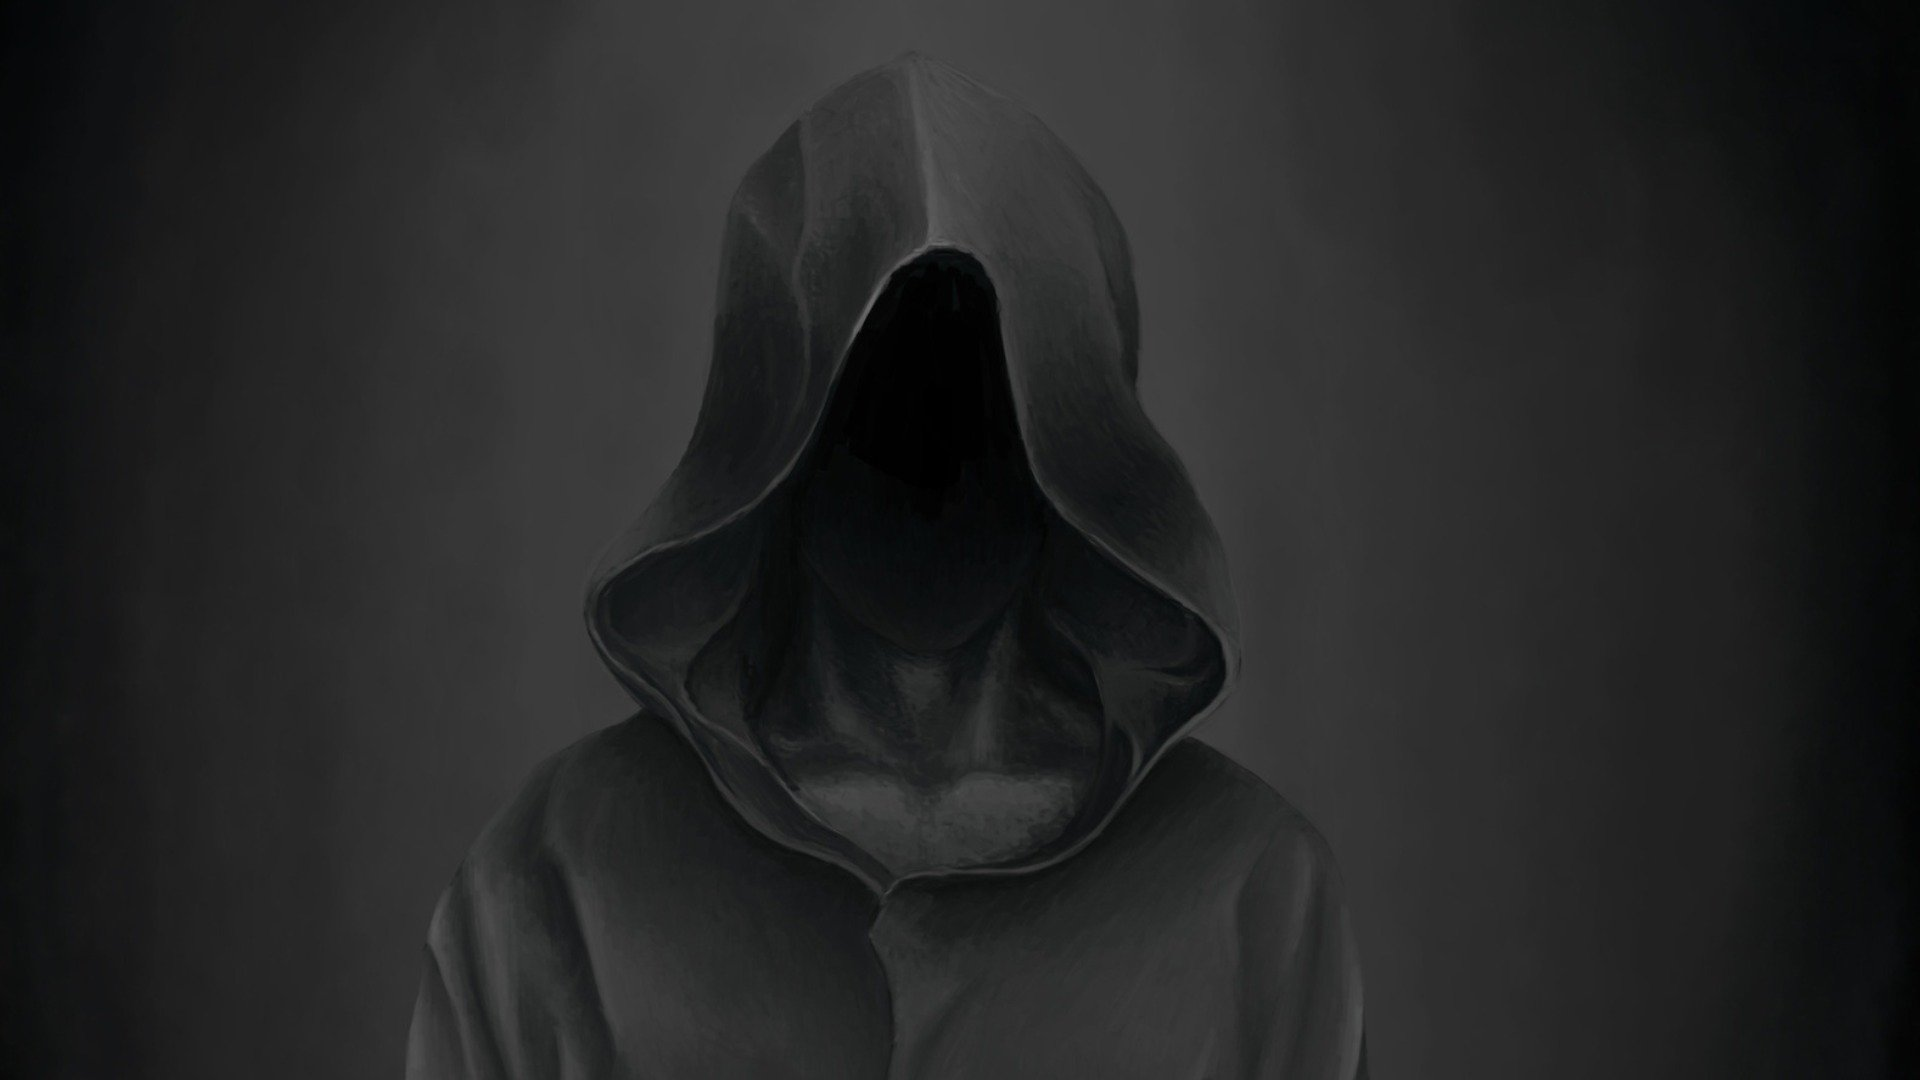 Картинки аватар последний маг основании